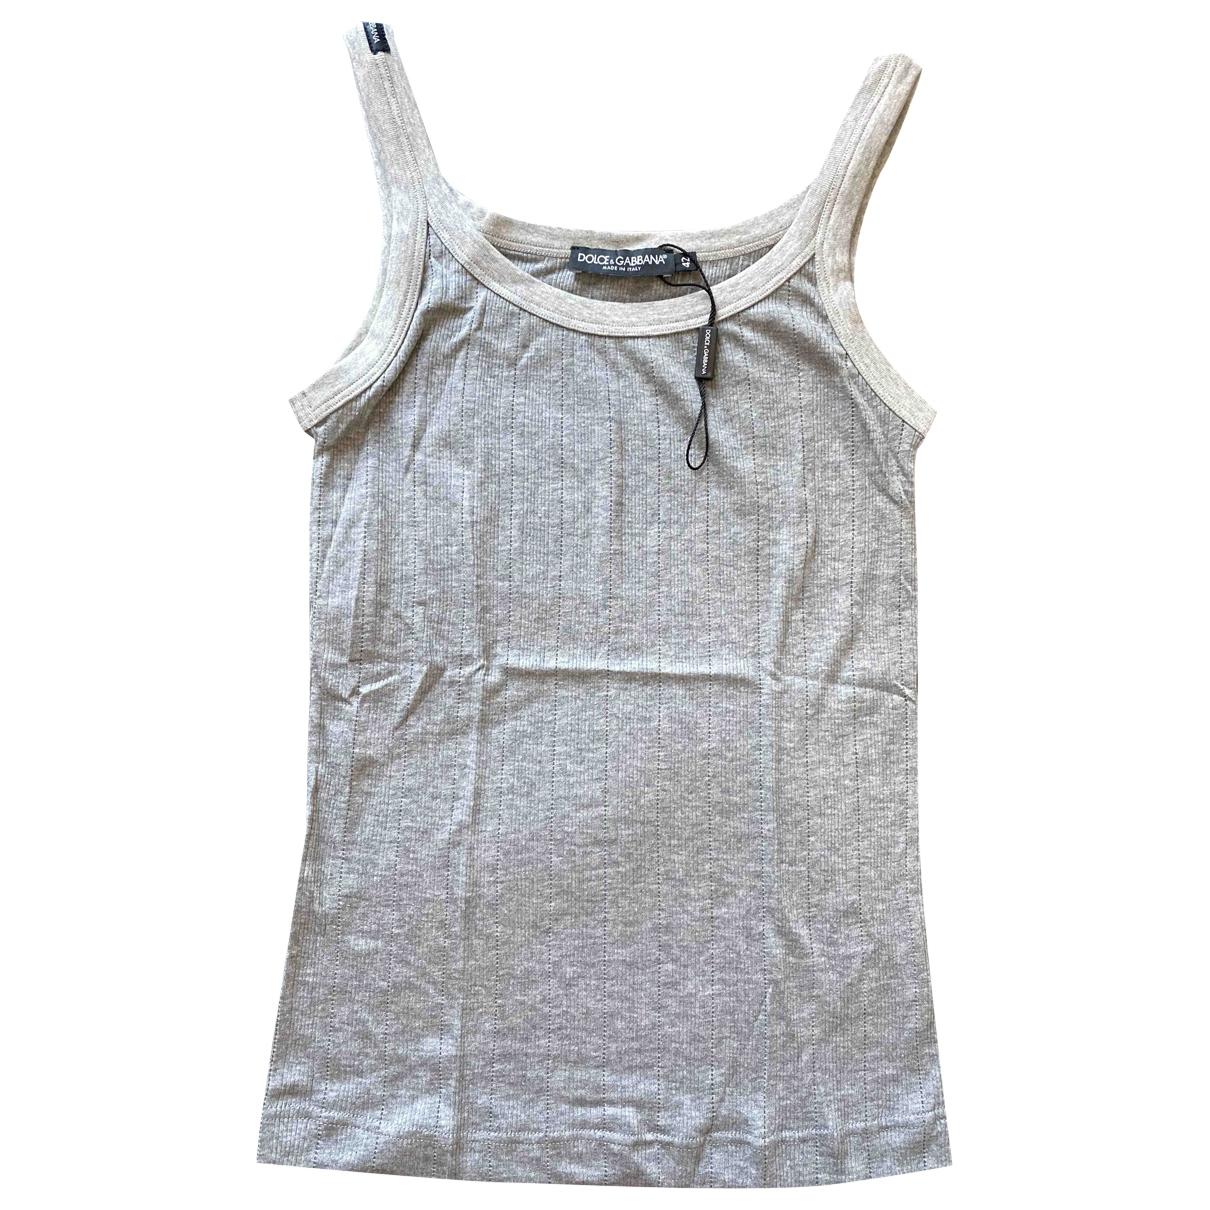 Dolce & Gabbana \N Top in  Grau Baumwolle